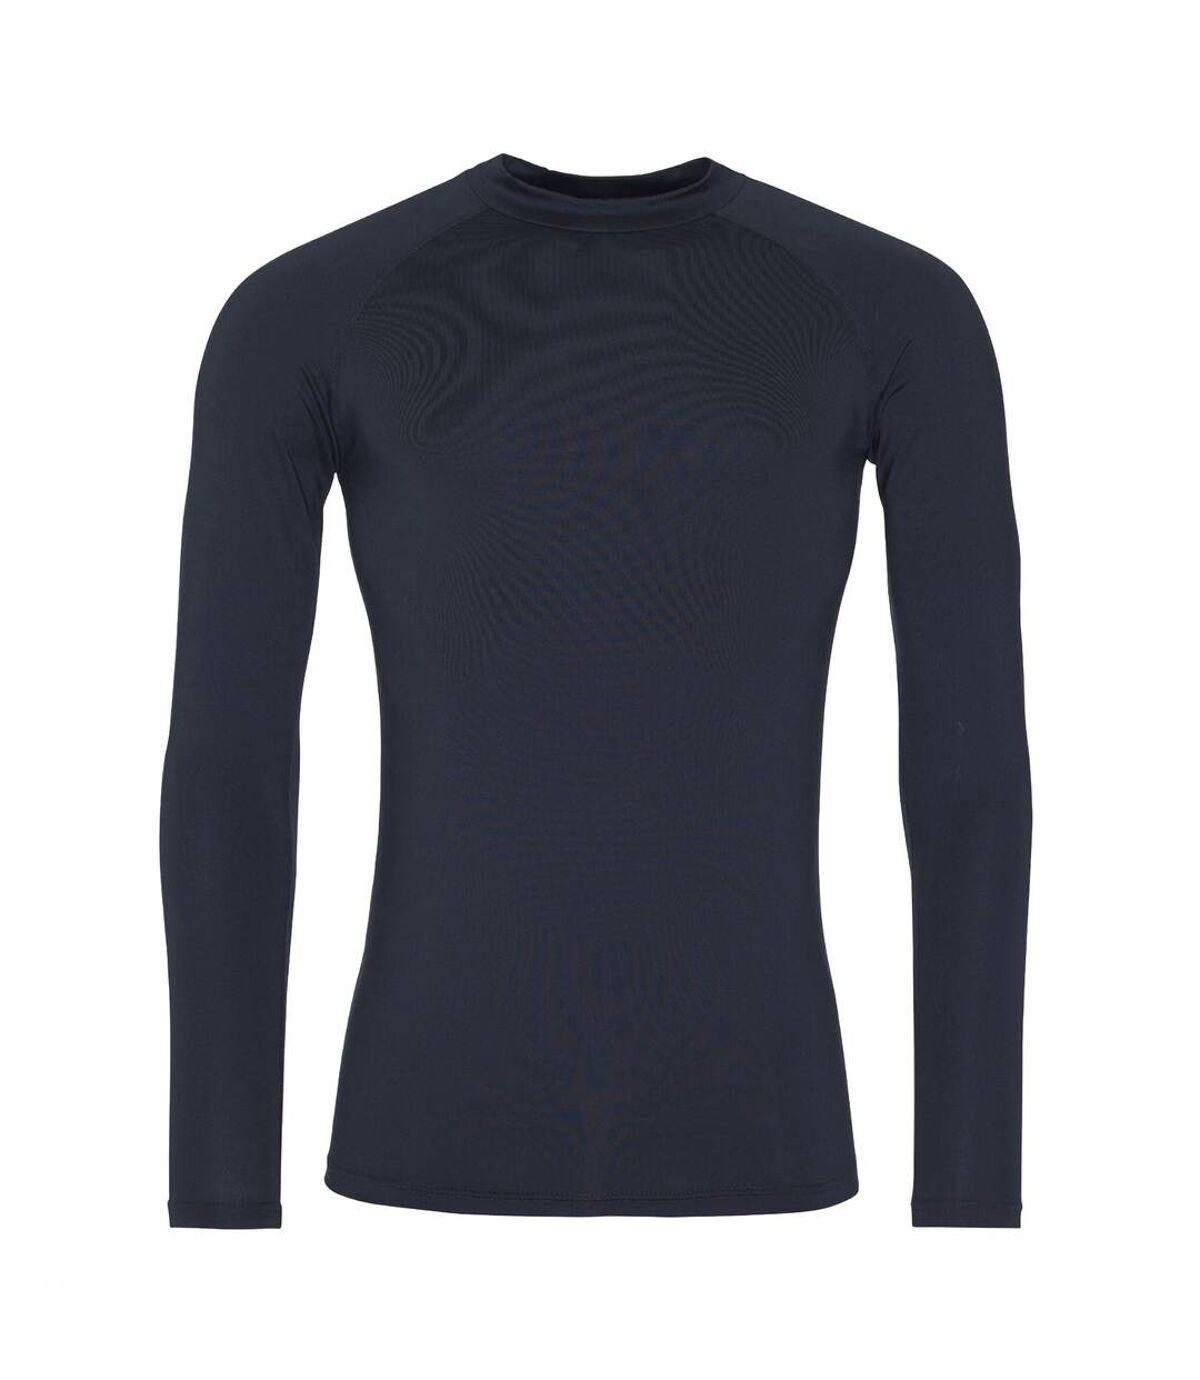 AWDis Just Cool Mens Long Sleeve Baselayer Top (French Navy) - UTRW5356